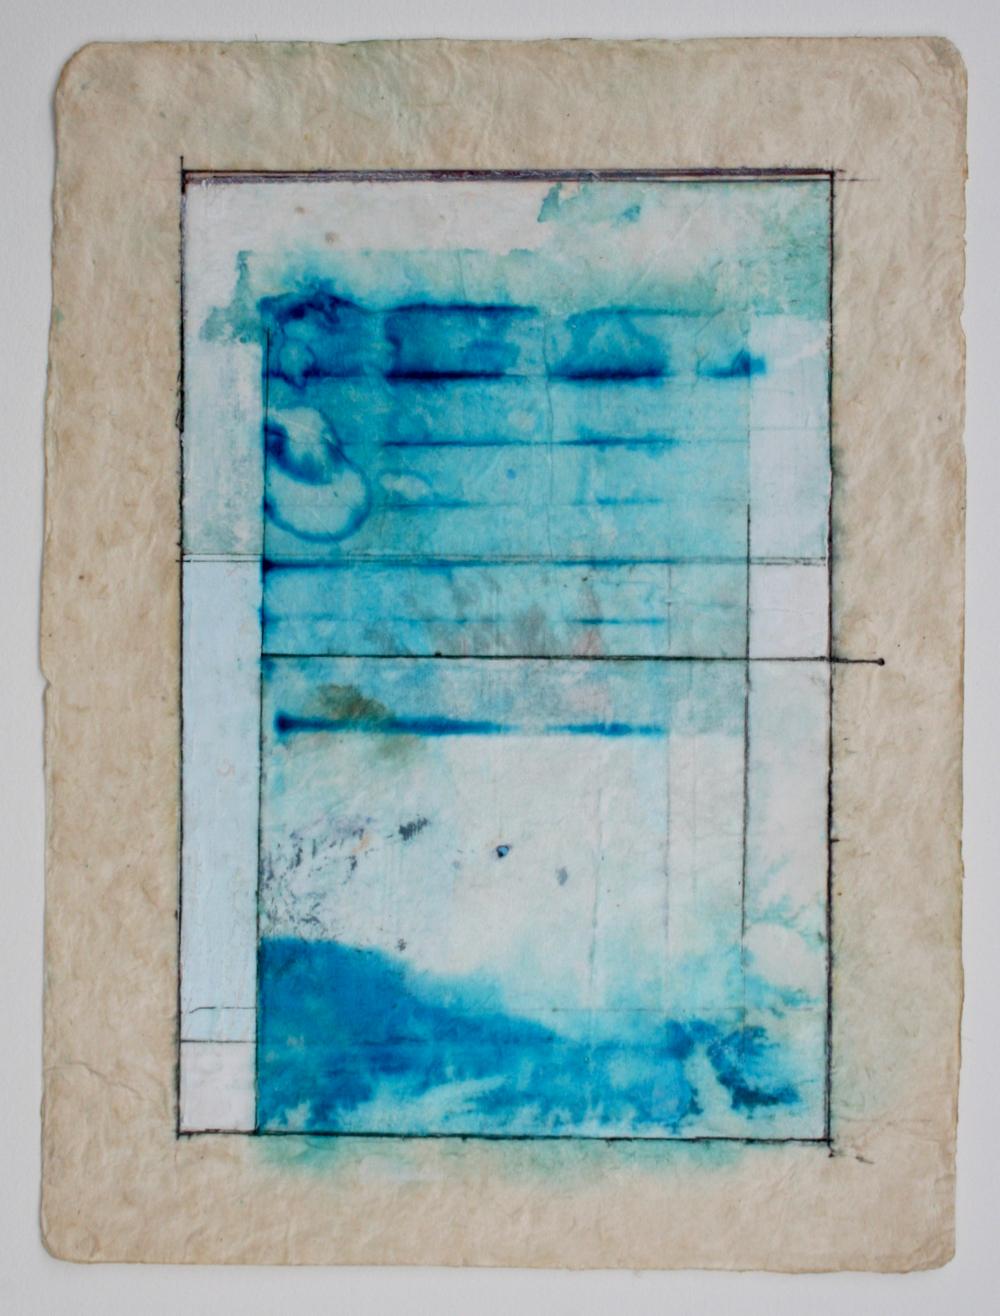 nectar  mixed media on paper  12 x 9  .  .